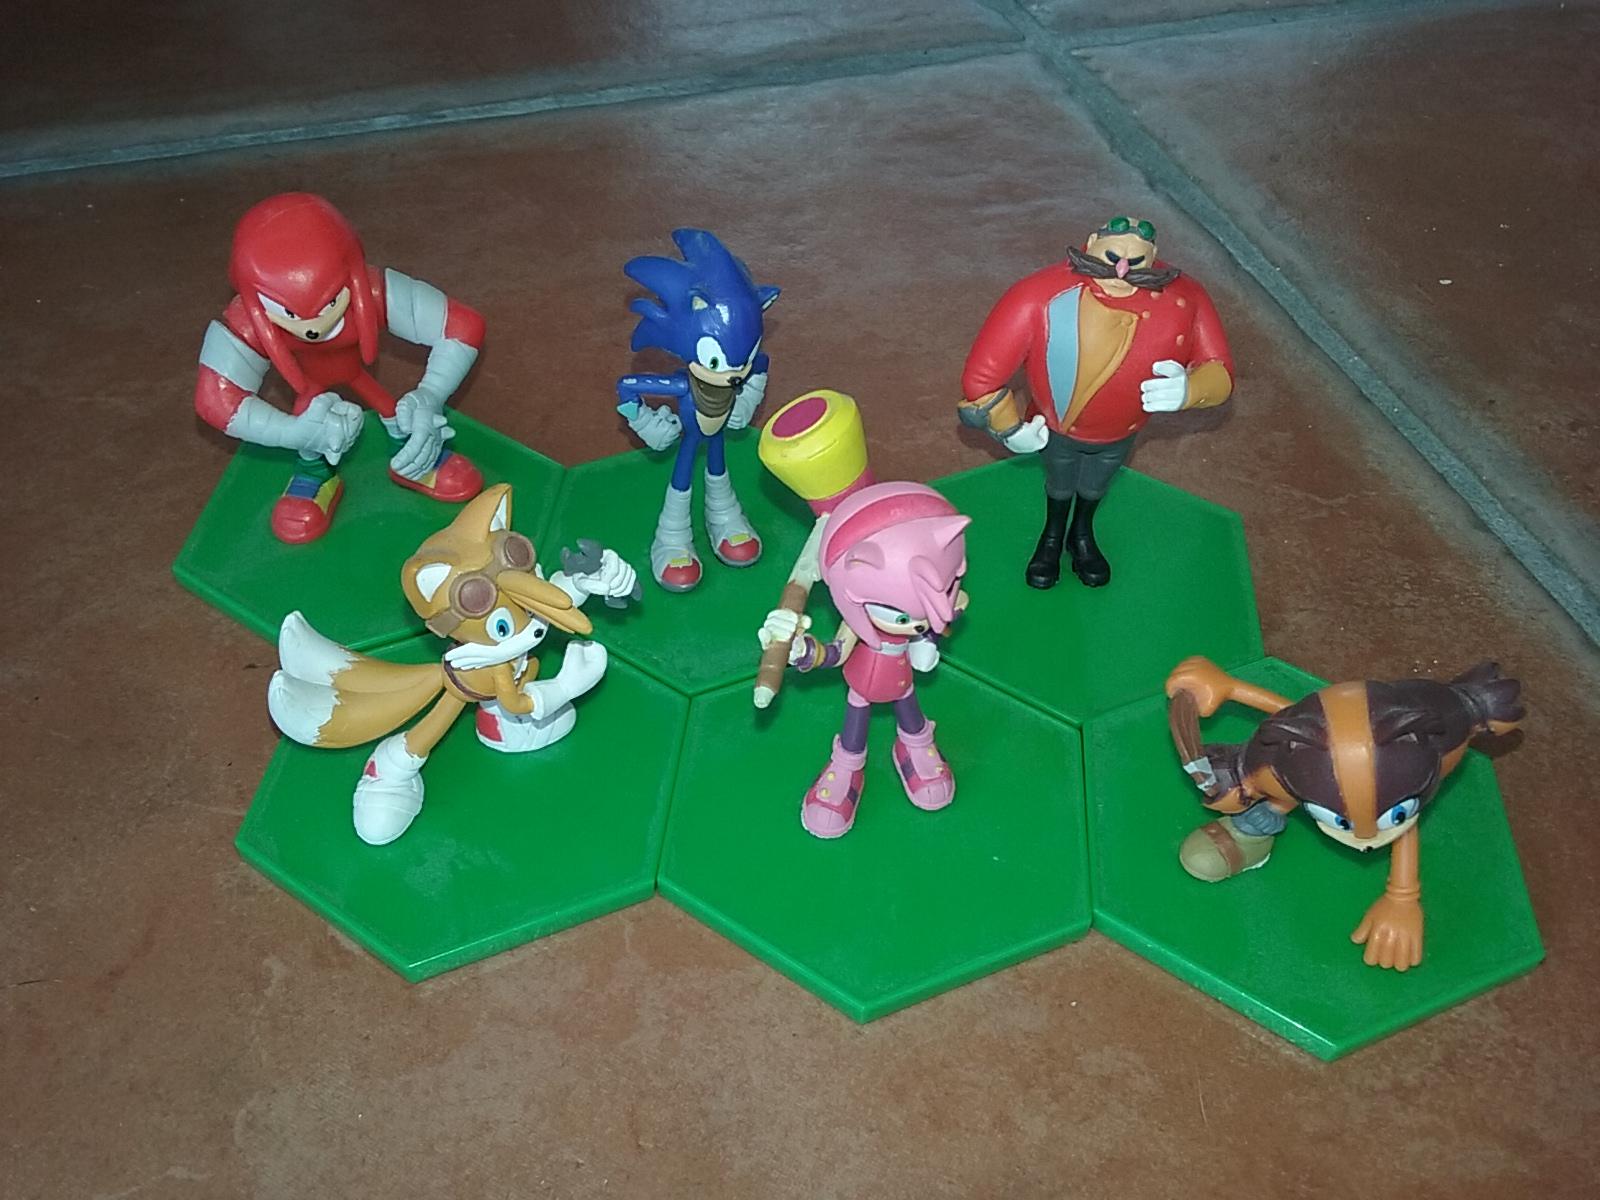 Sega_OuiDo!_SonicBoom0318.jpg